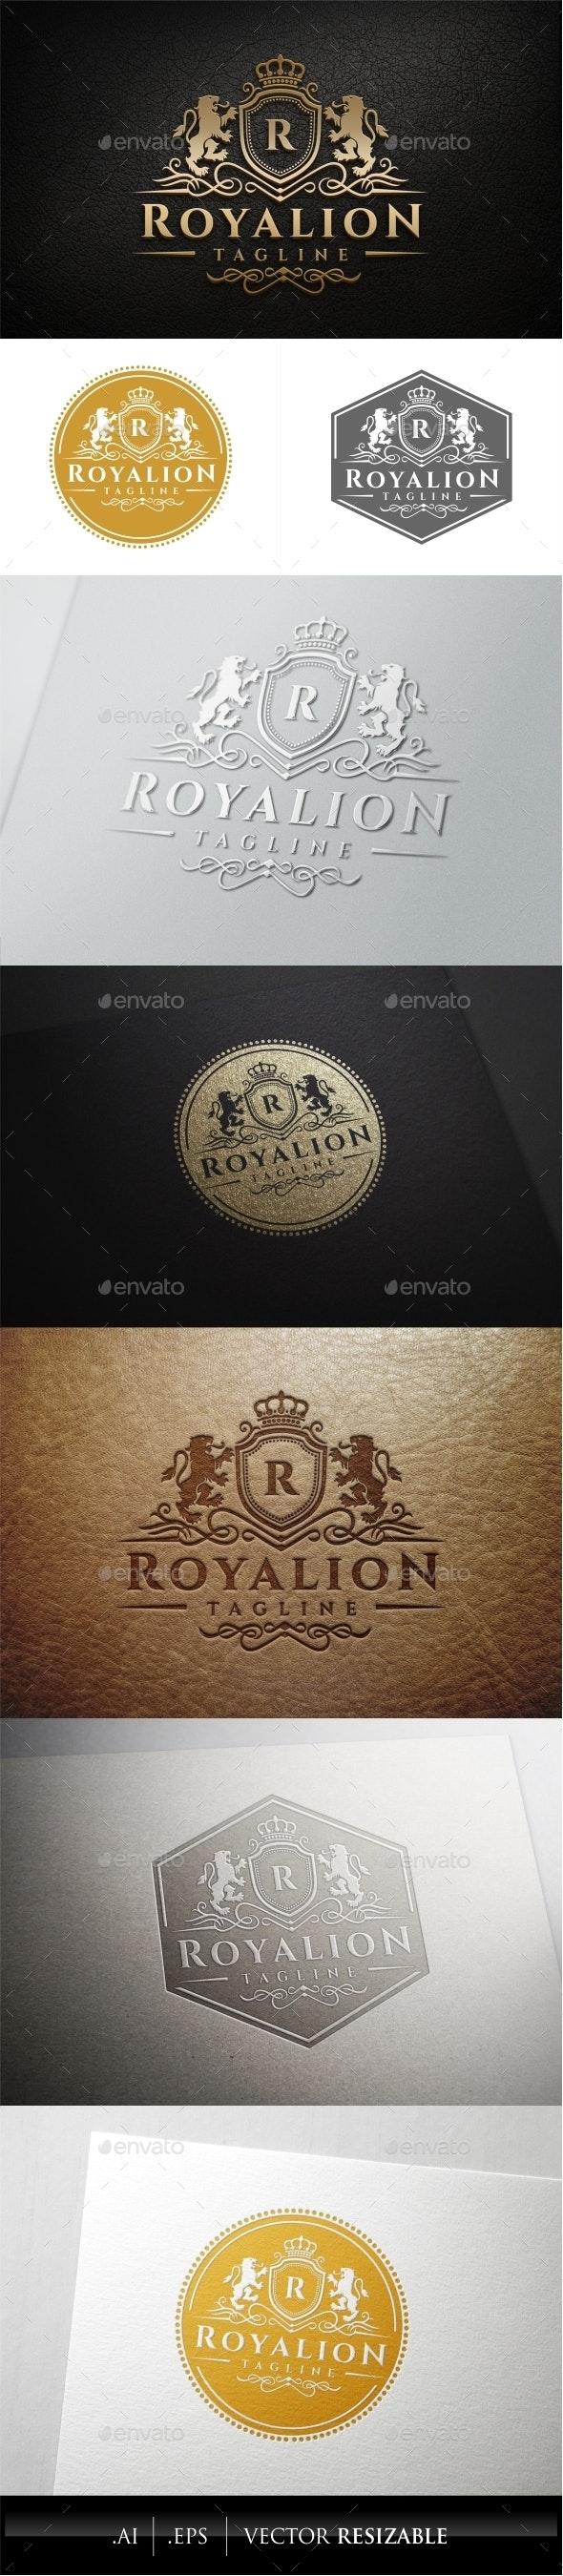 Royal Lion Logo Template - Crests Logo Templates